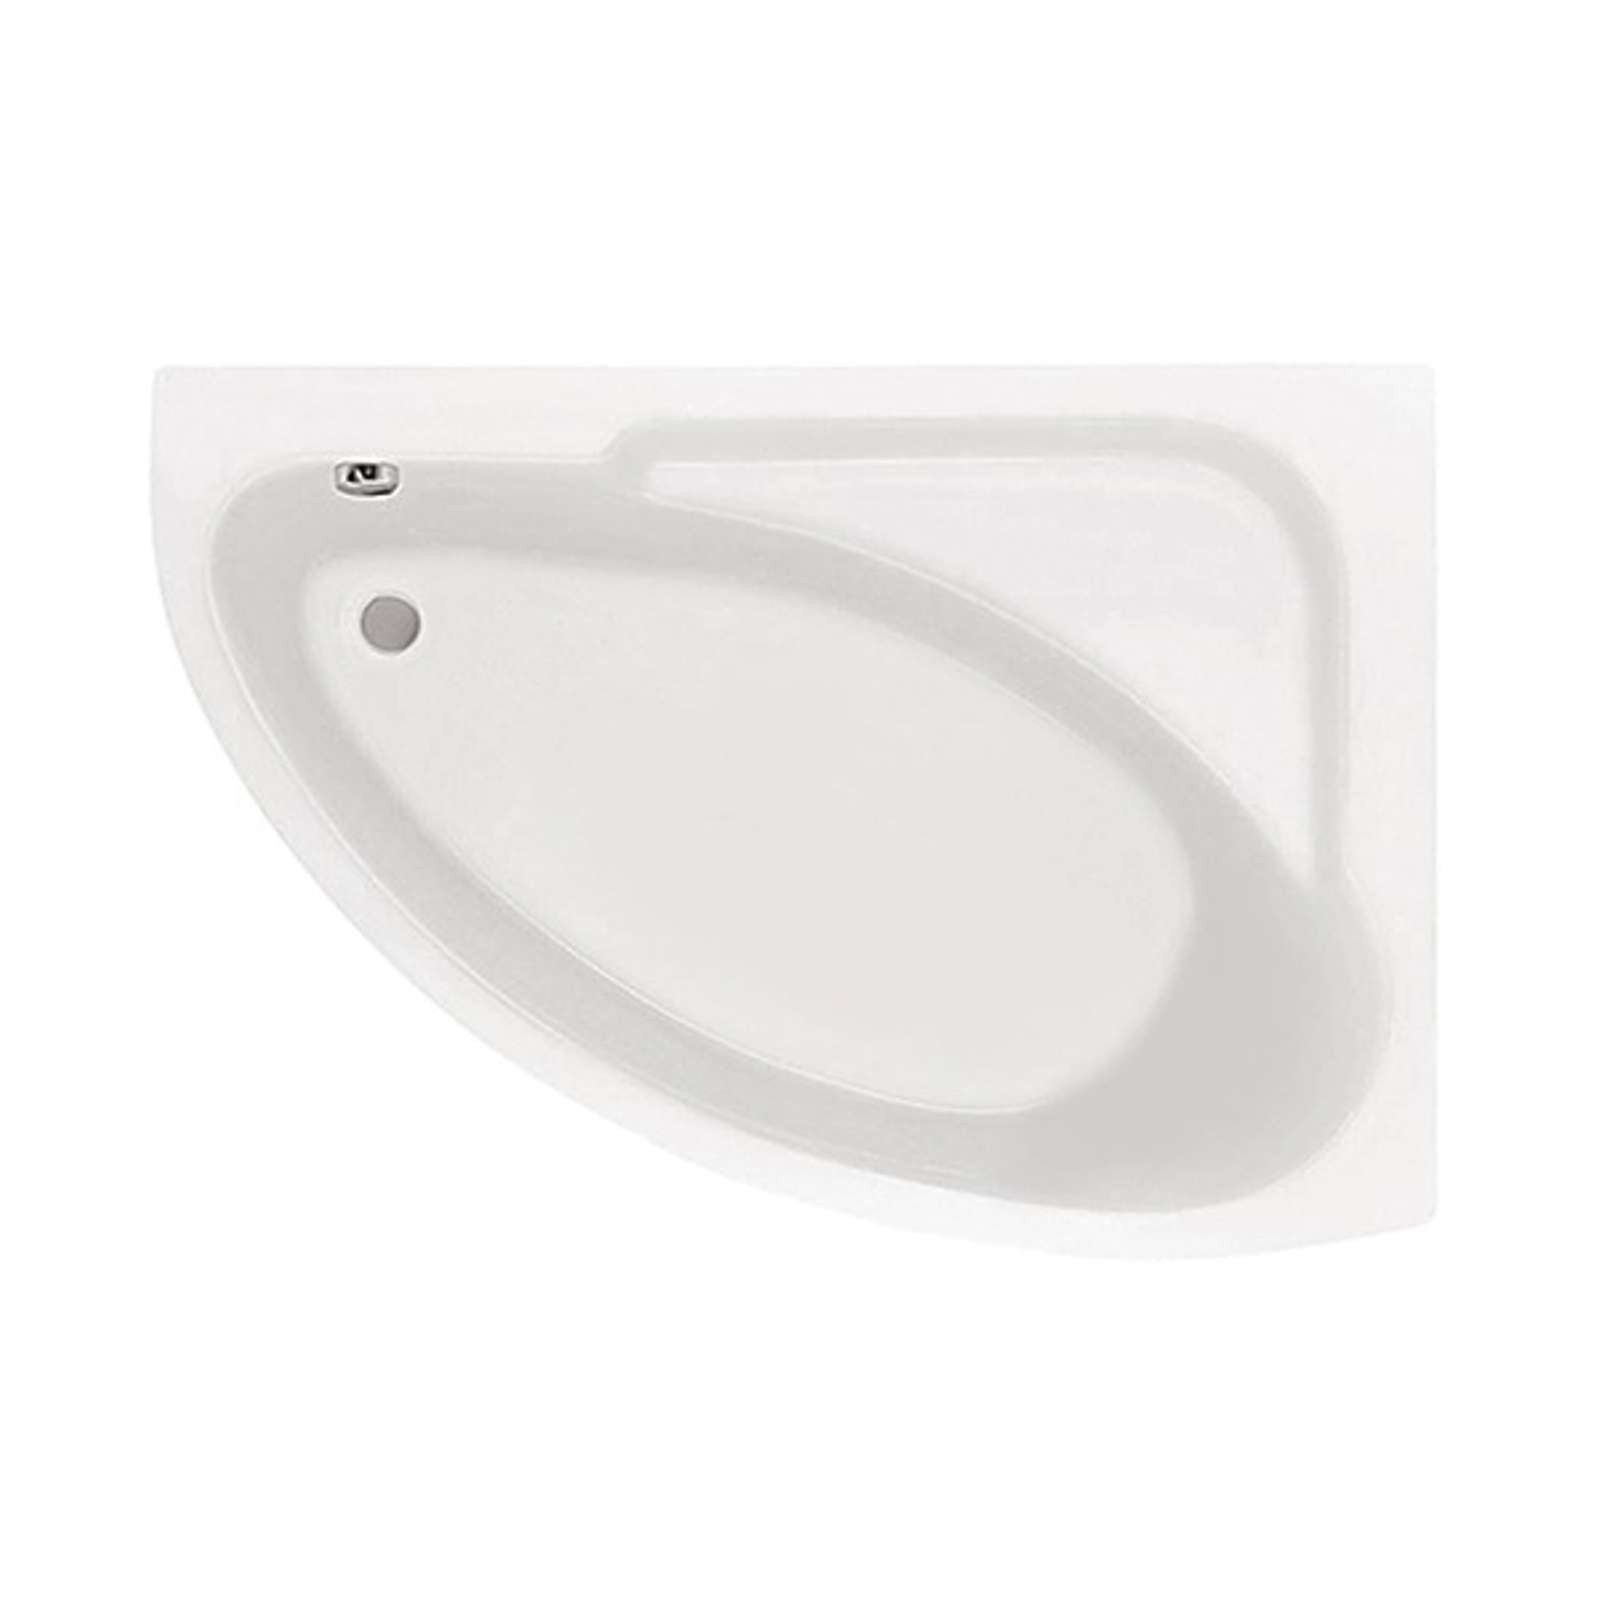 Ванна акриловая Santek - Гоа 150х100 см правая